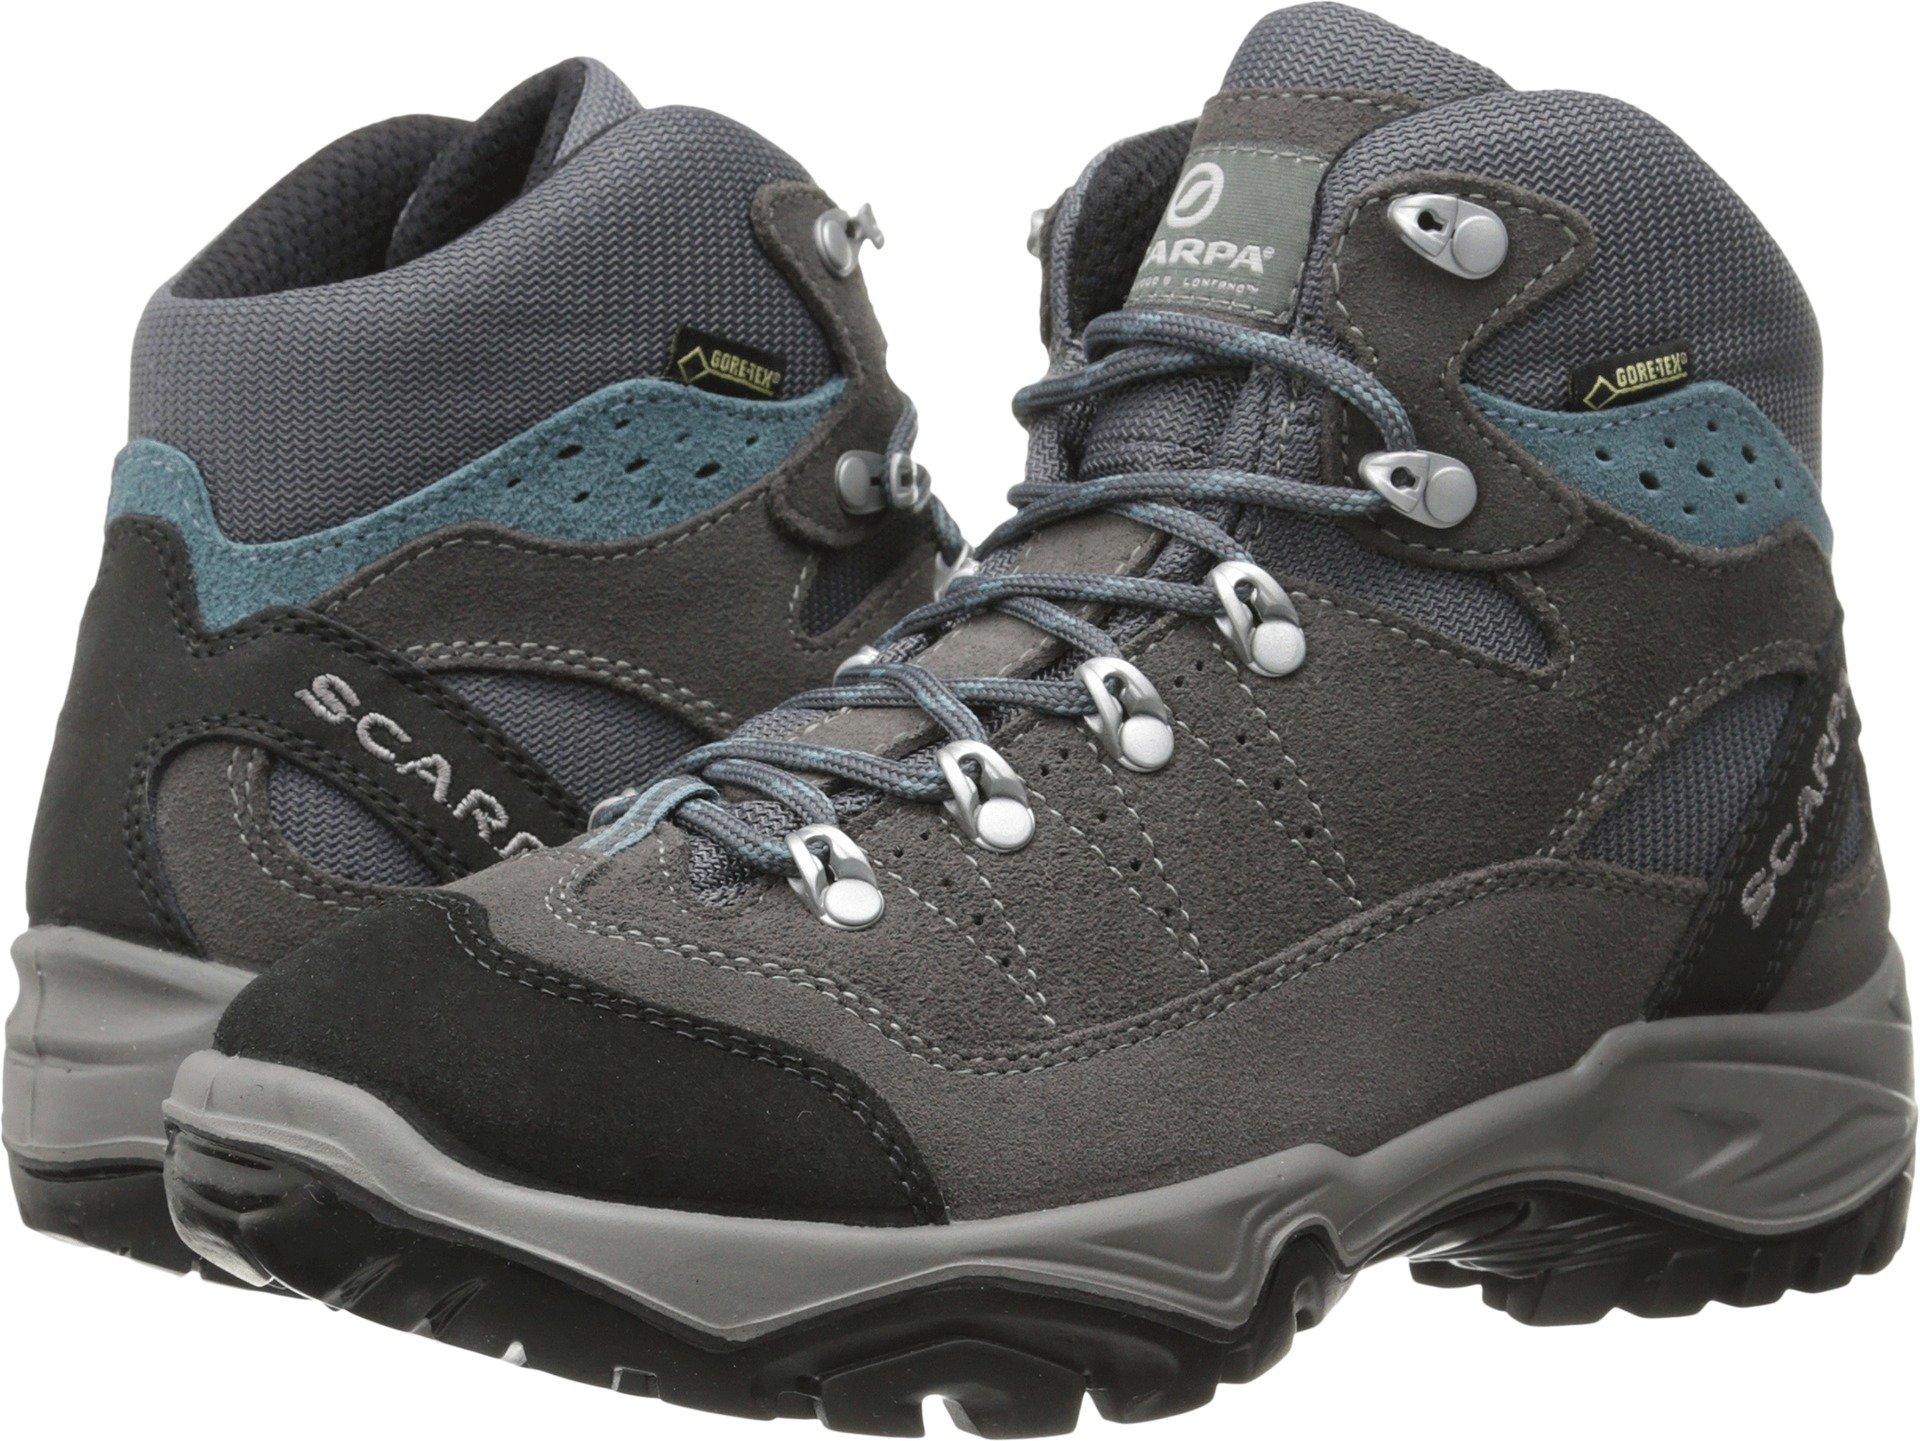 Scarpa Women's Mistral GTX Hiking Boot,Smoke/Polor Blue,41 EU/9 M US